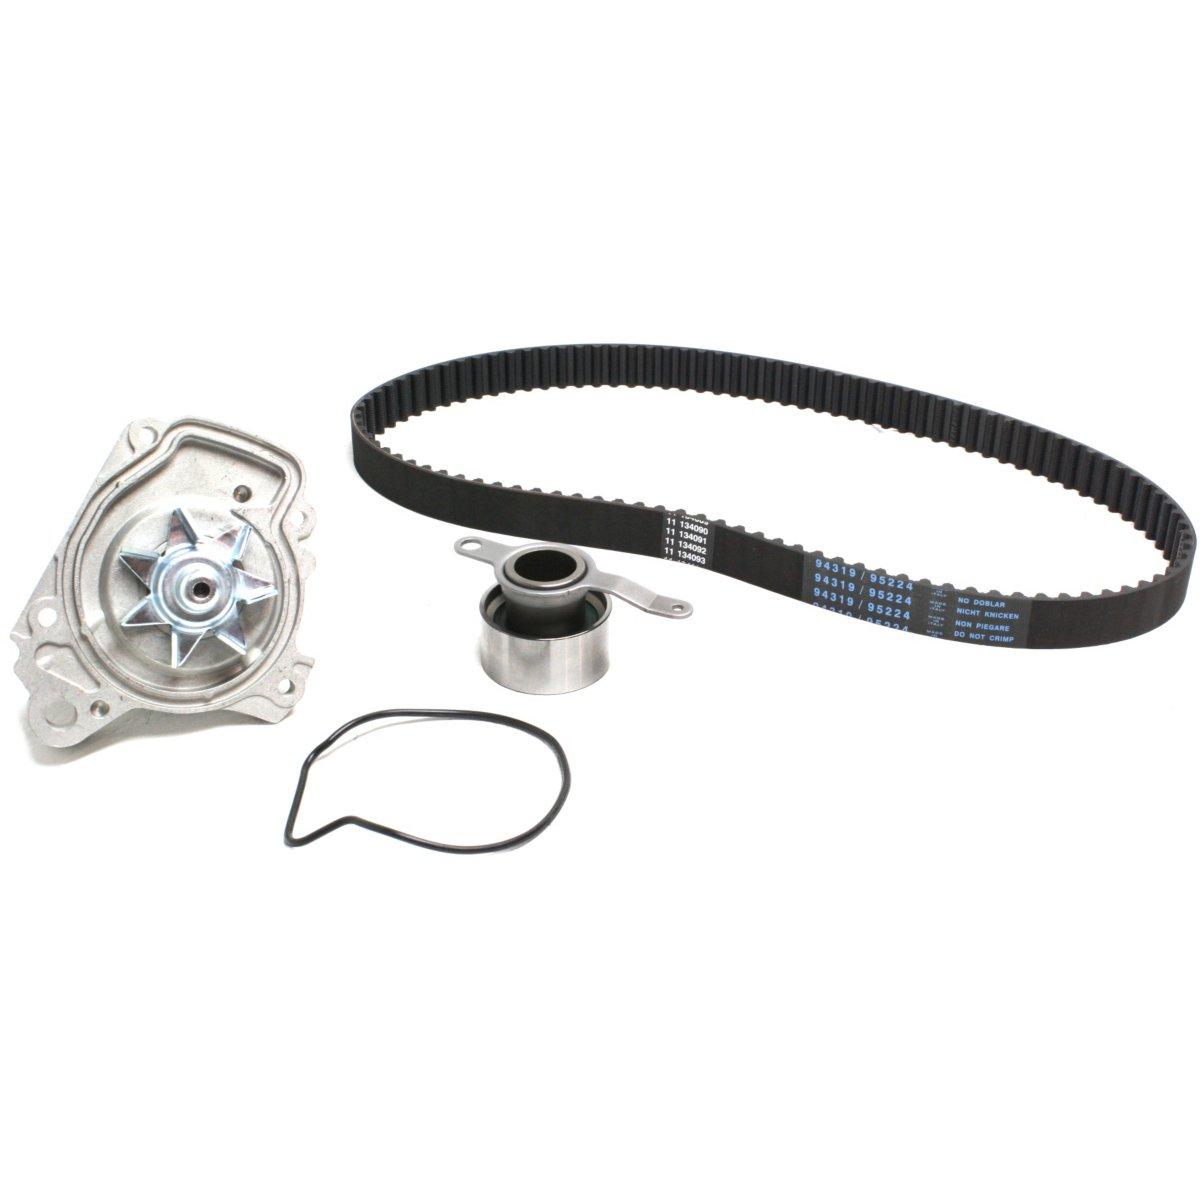 New dayco timing belt kit civic for honda del sol 2000 99 for Honda civic timing belt replacement